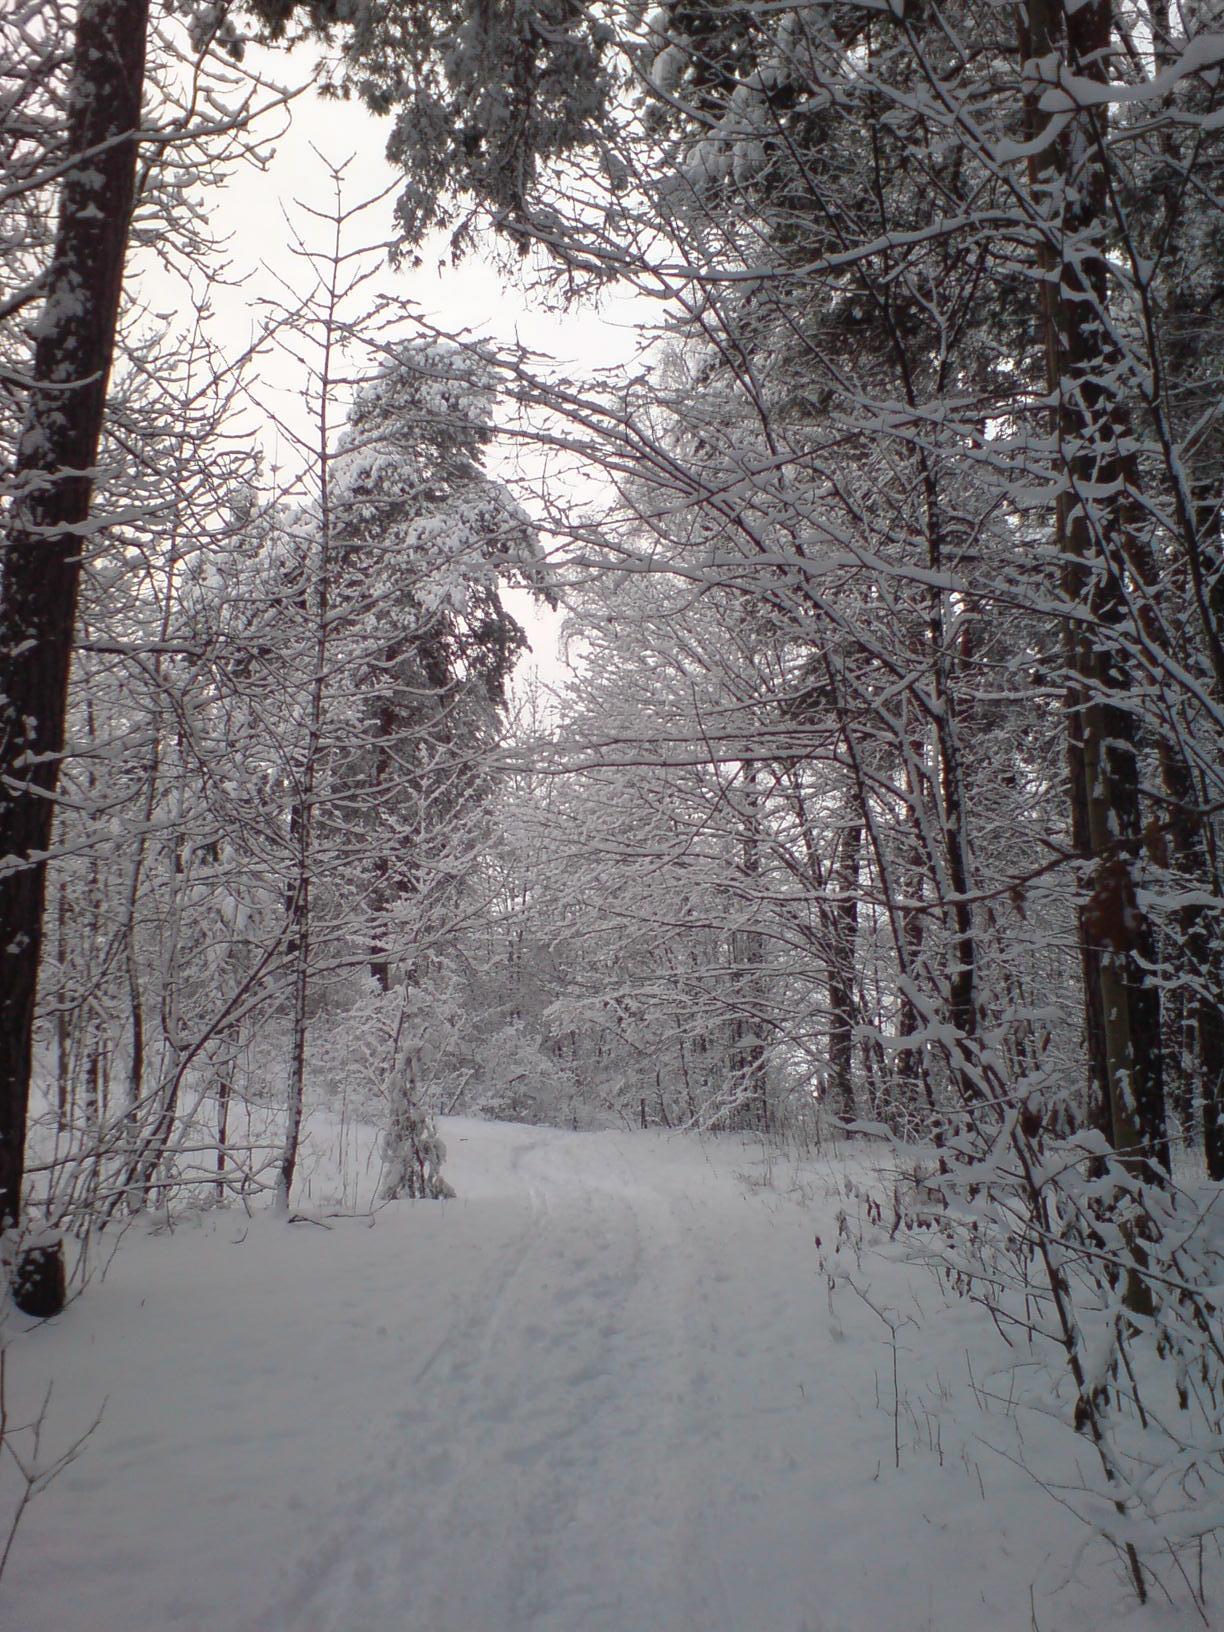 First snow in Oslo - Winter Photo (603768) - Fanpop